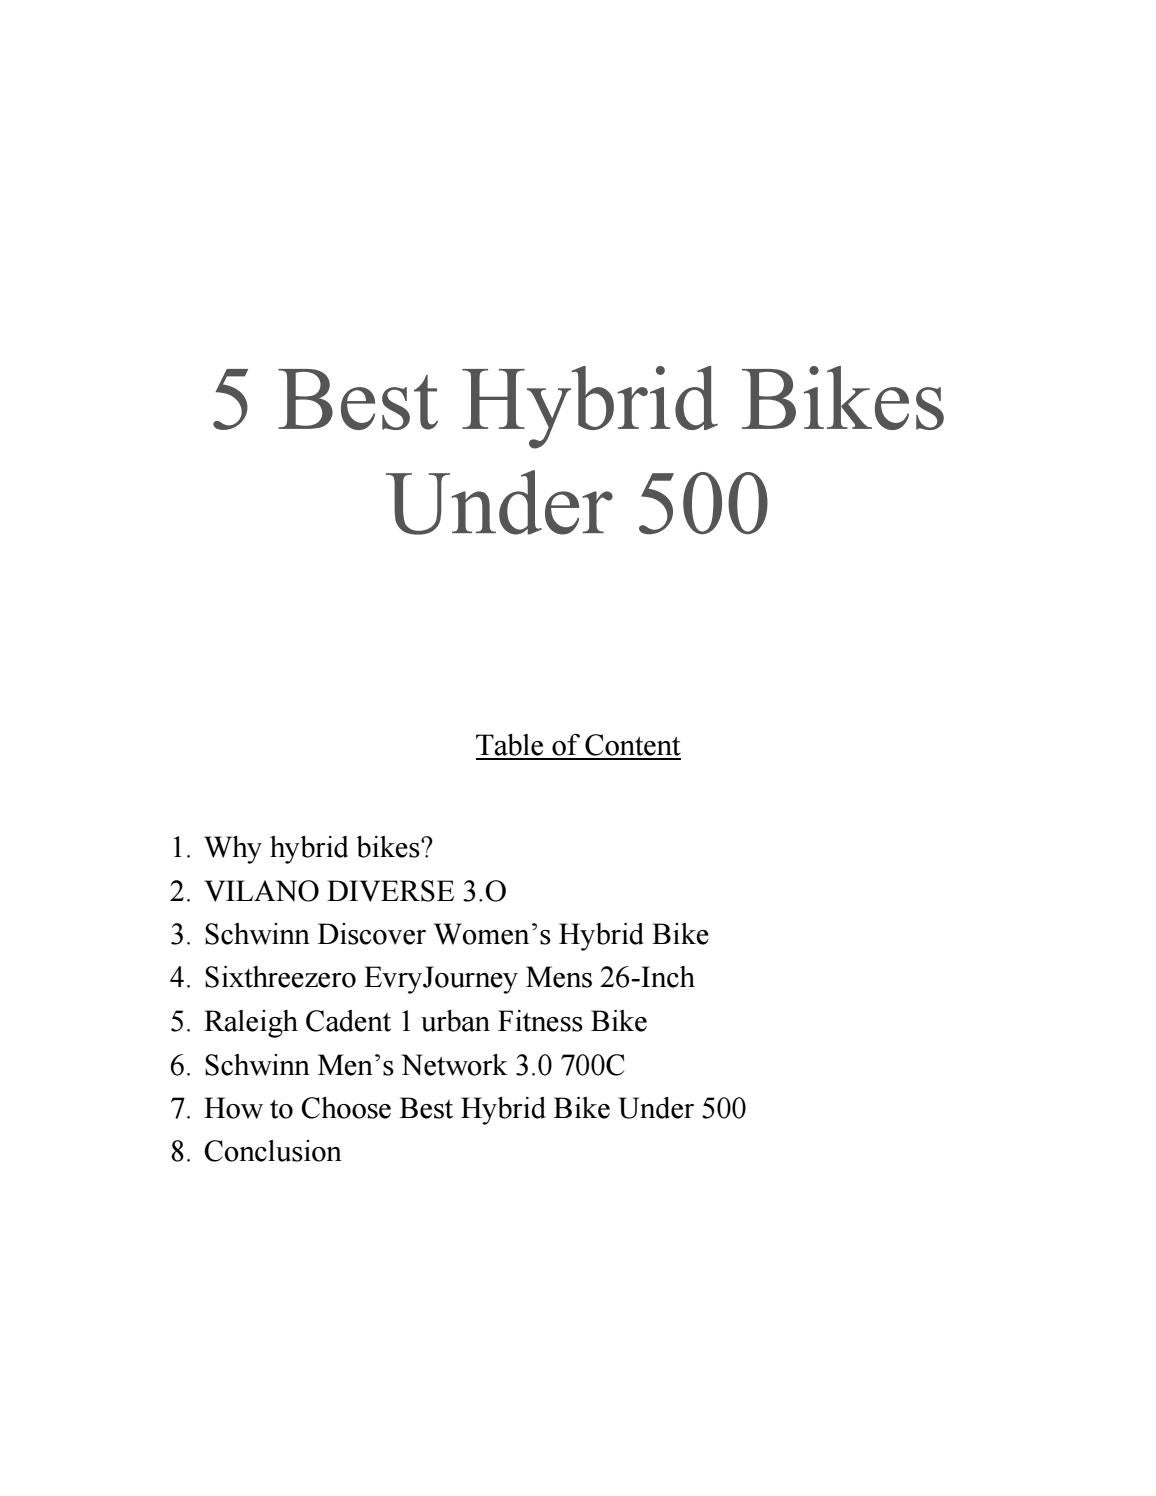 5 Best Hybrid Bikes Under 500 by One Sport Ninja - issuu